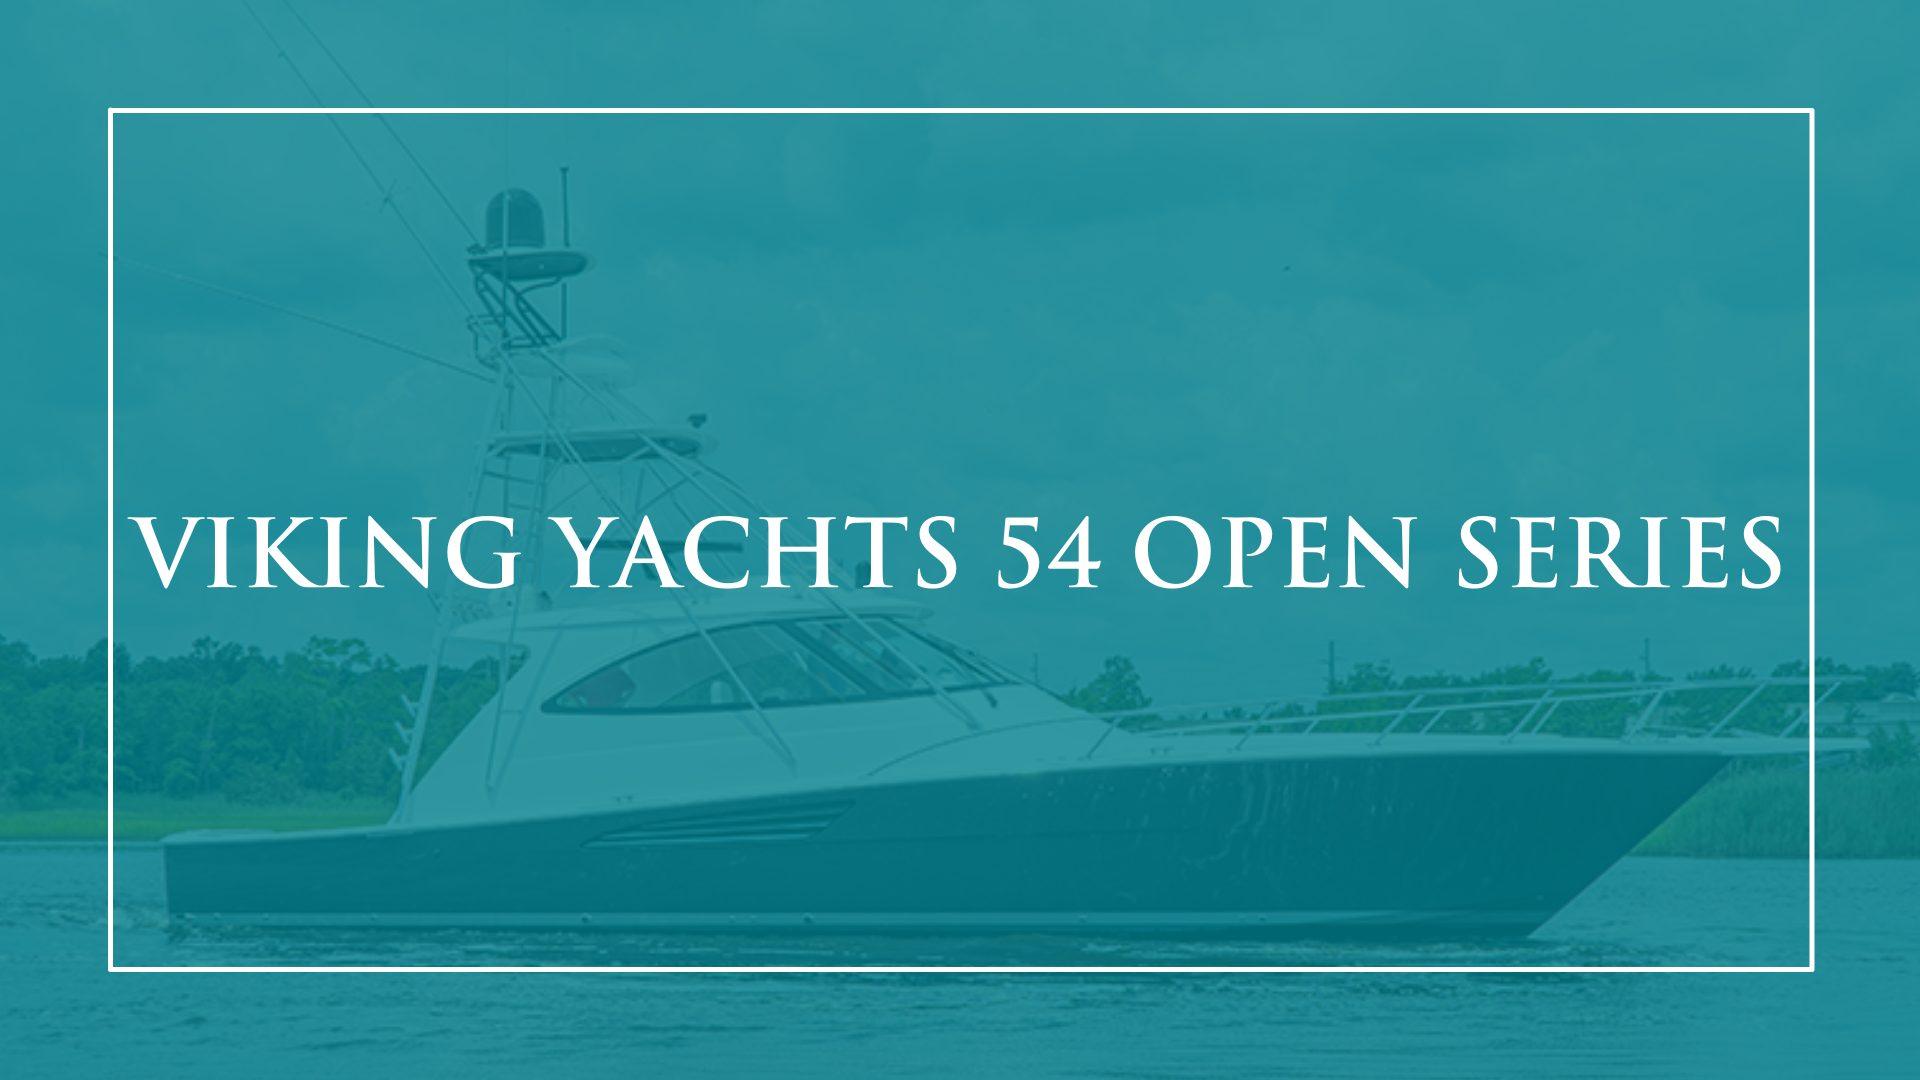 Viking Yachts 54′ Open Series